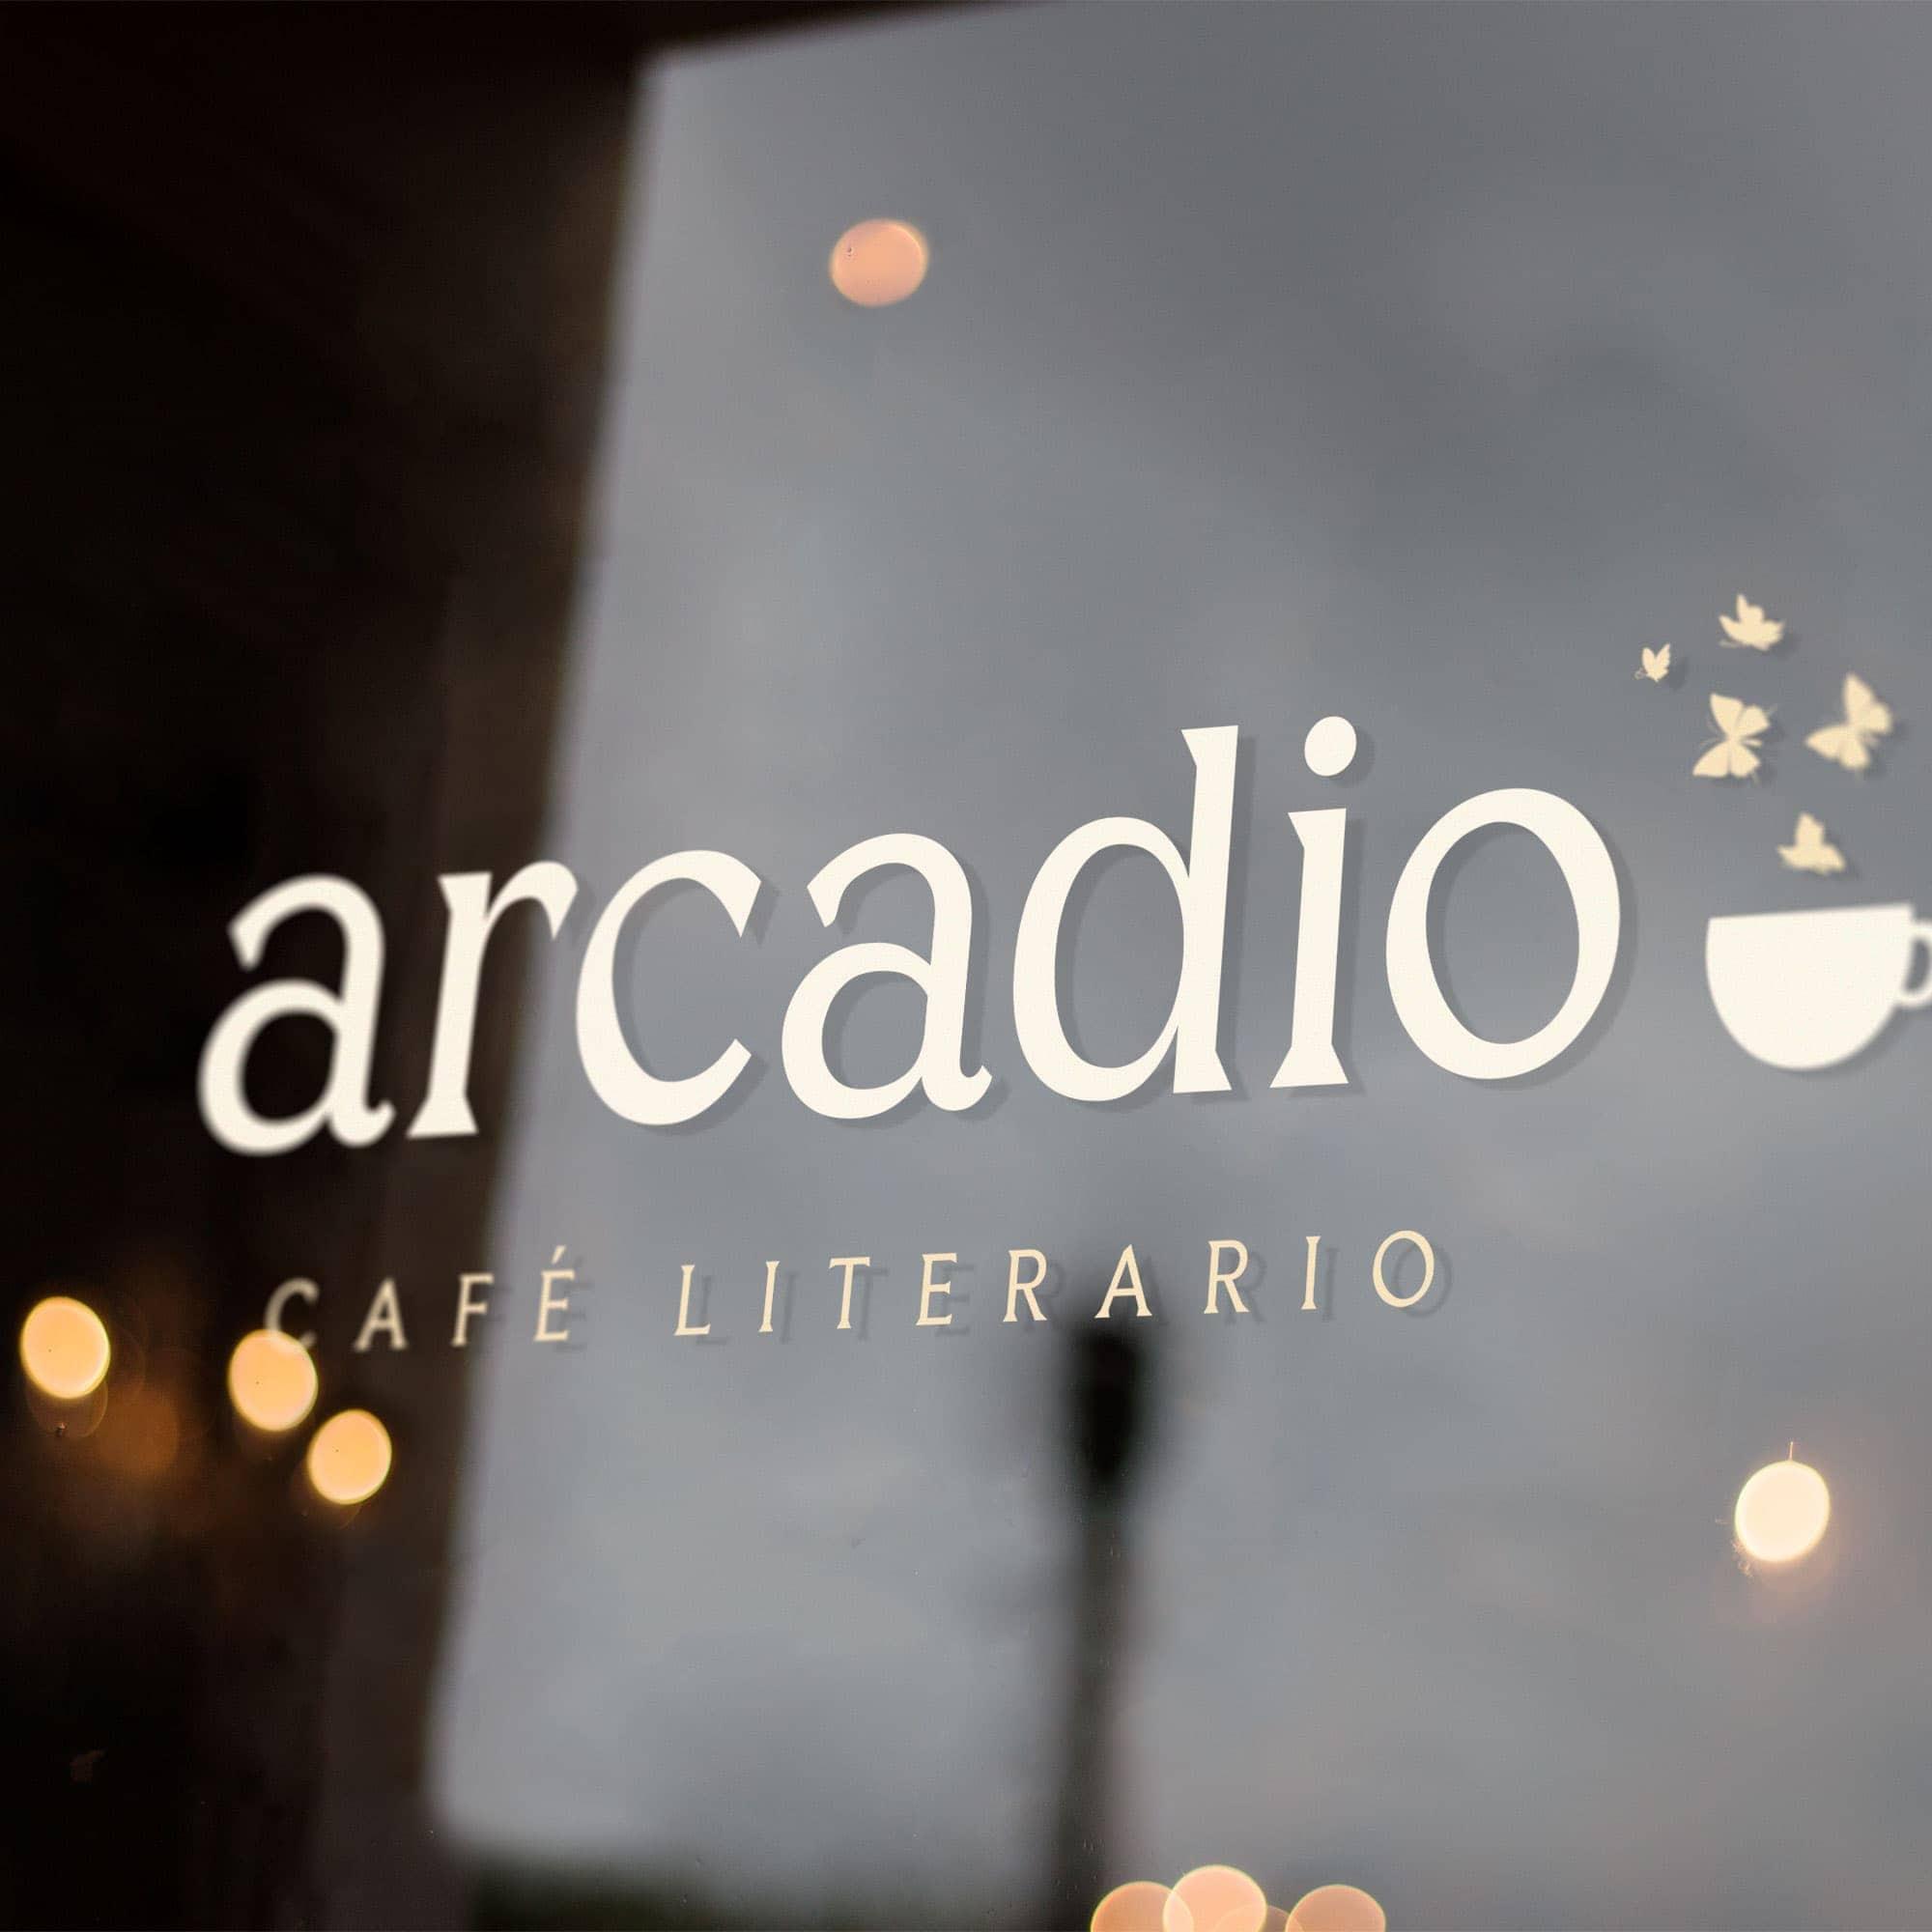 Arcadio: Cafe Brand Identity Design